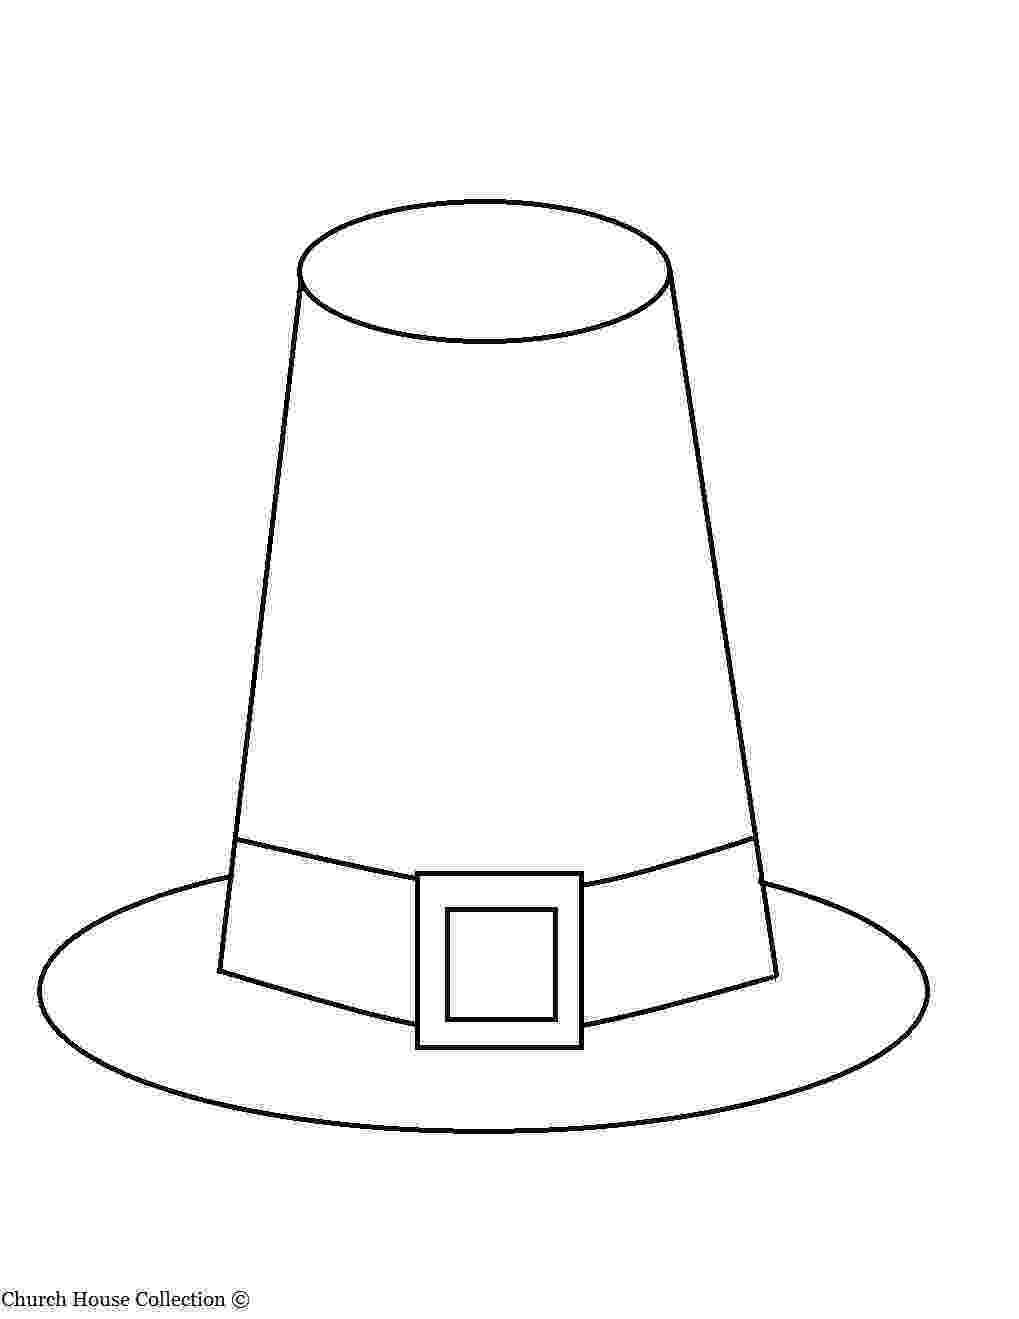 pilgrim hat coloring page 15 free printable thanksgiving coloring pages gettin coloring page hat pilgrim